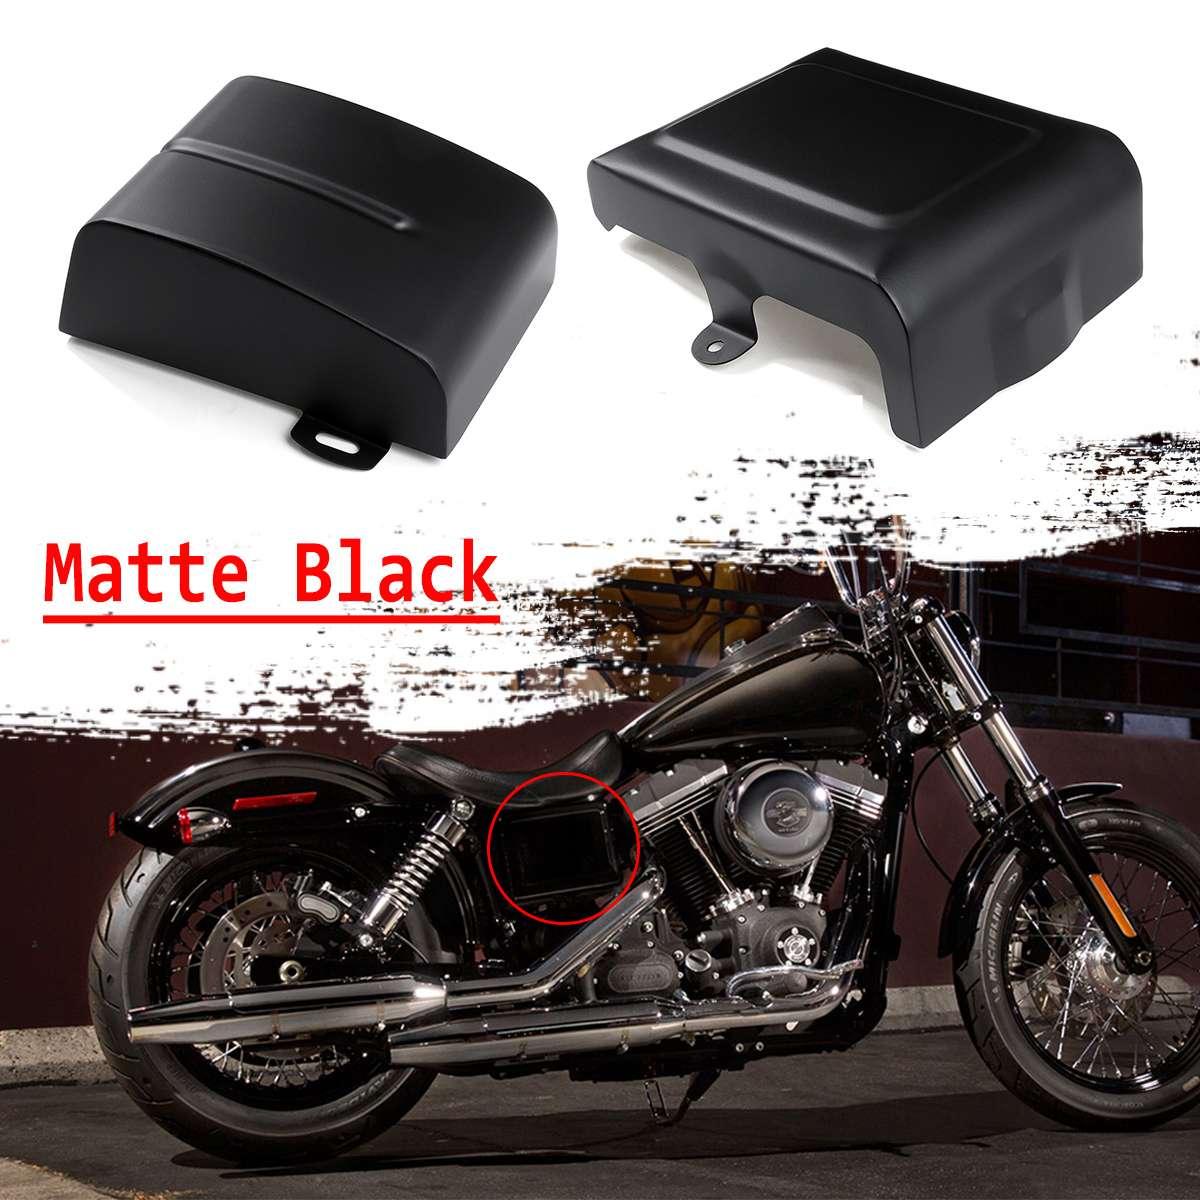 Matt Black Heat Shields Air Deflector Set For 2006-2018 Harley Dyna Fat Bob